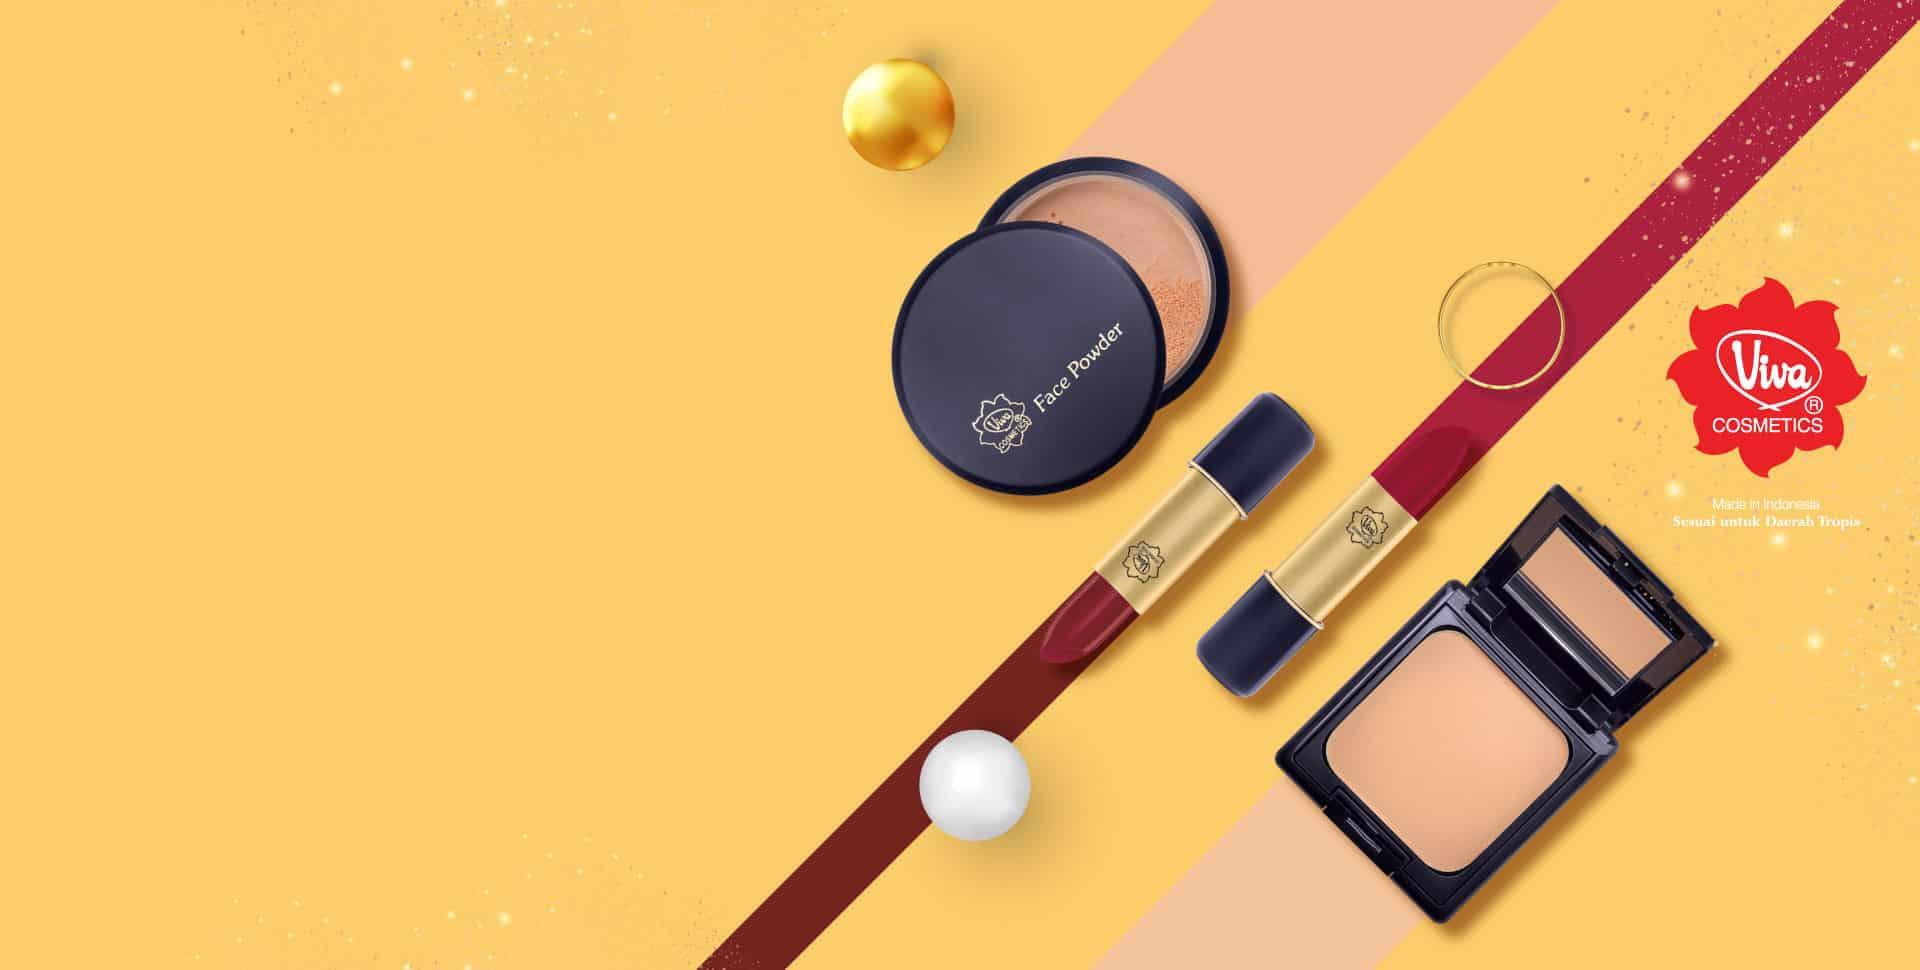 Viva-Cosmetics